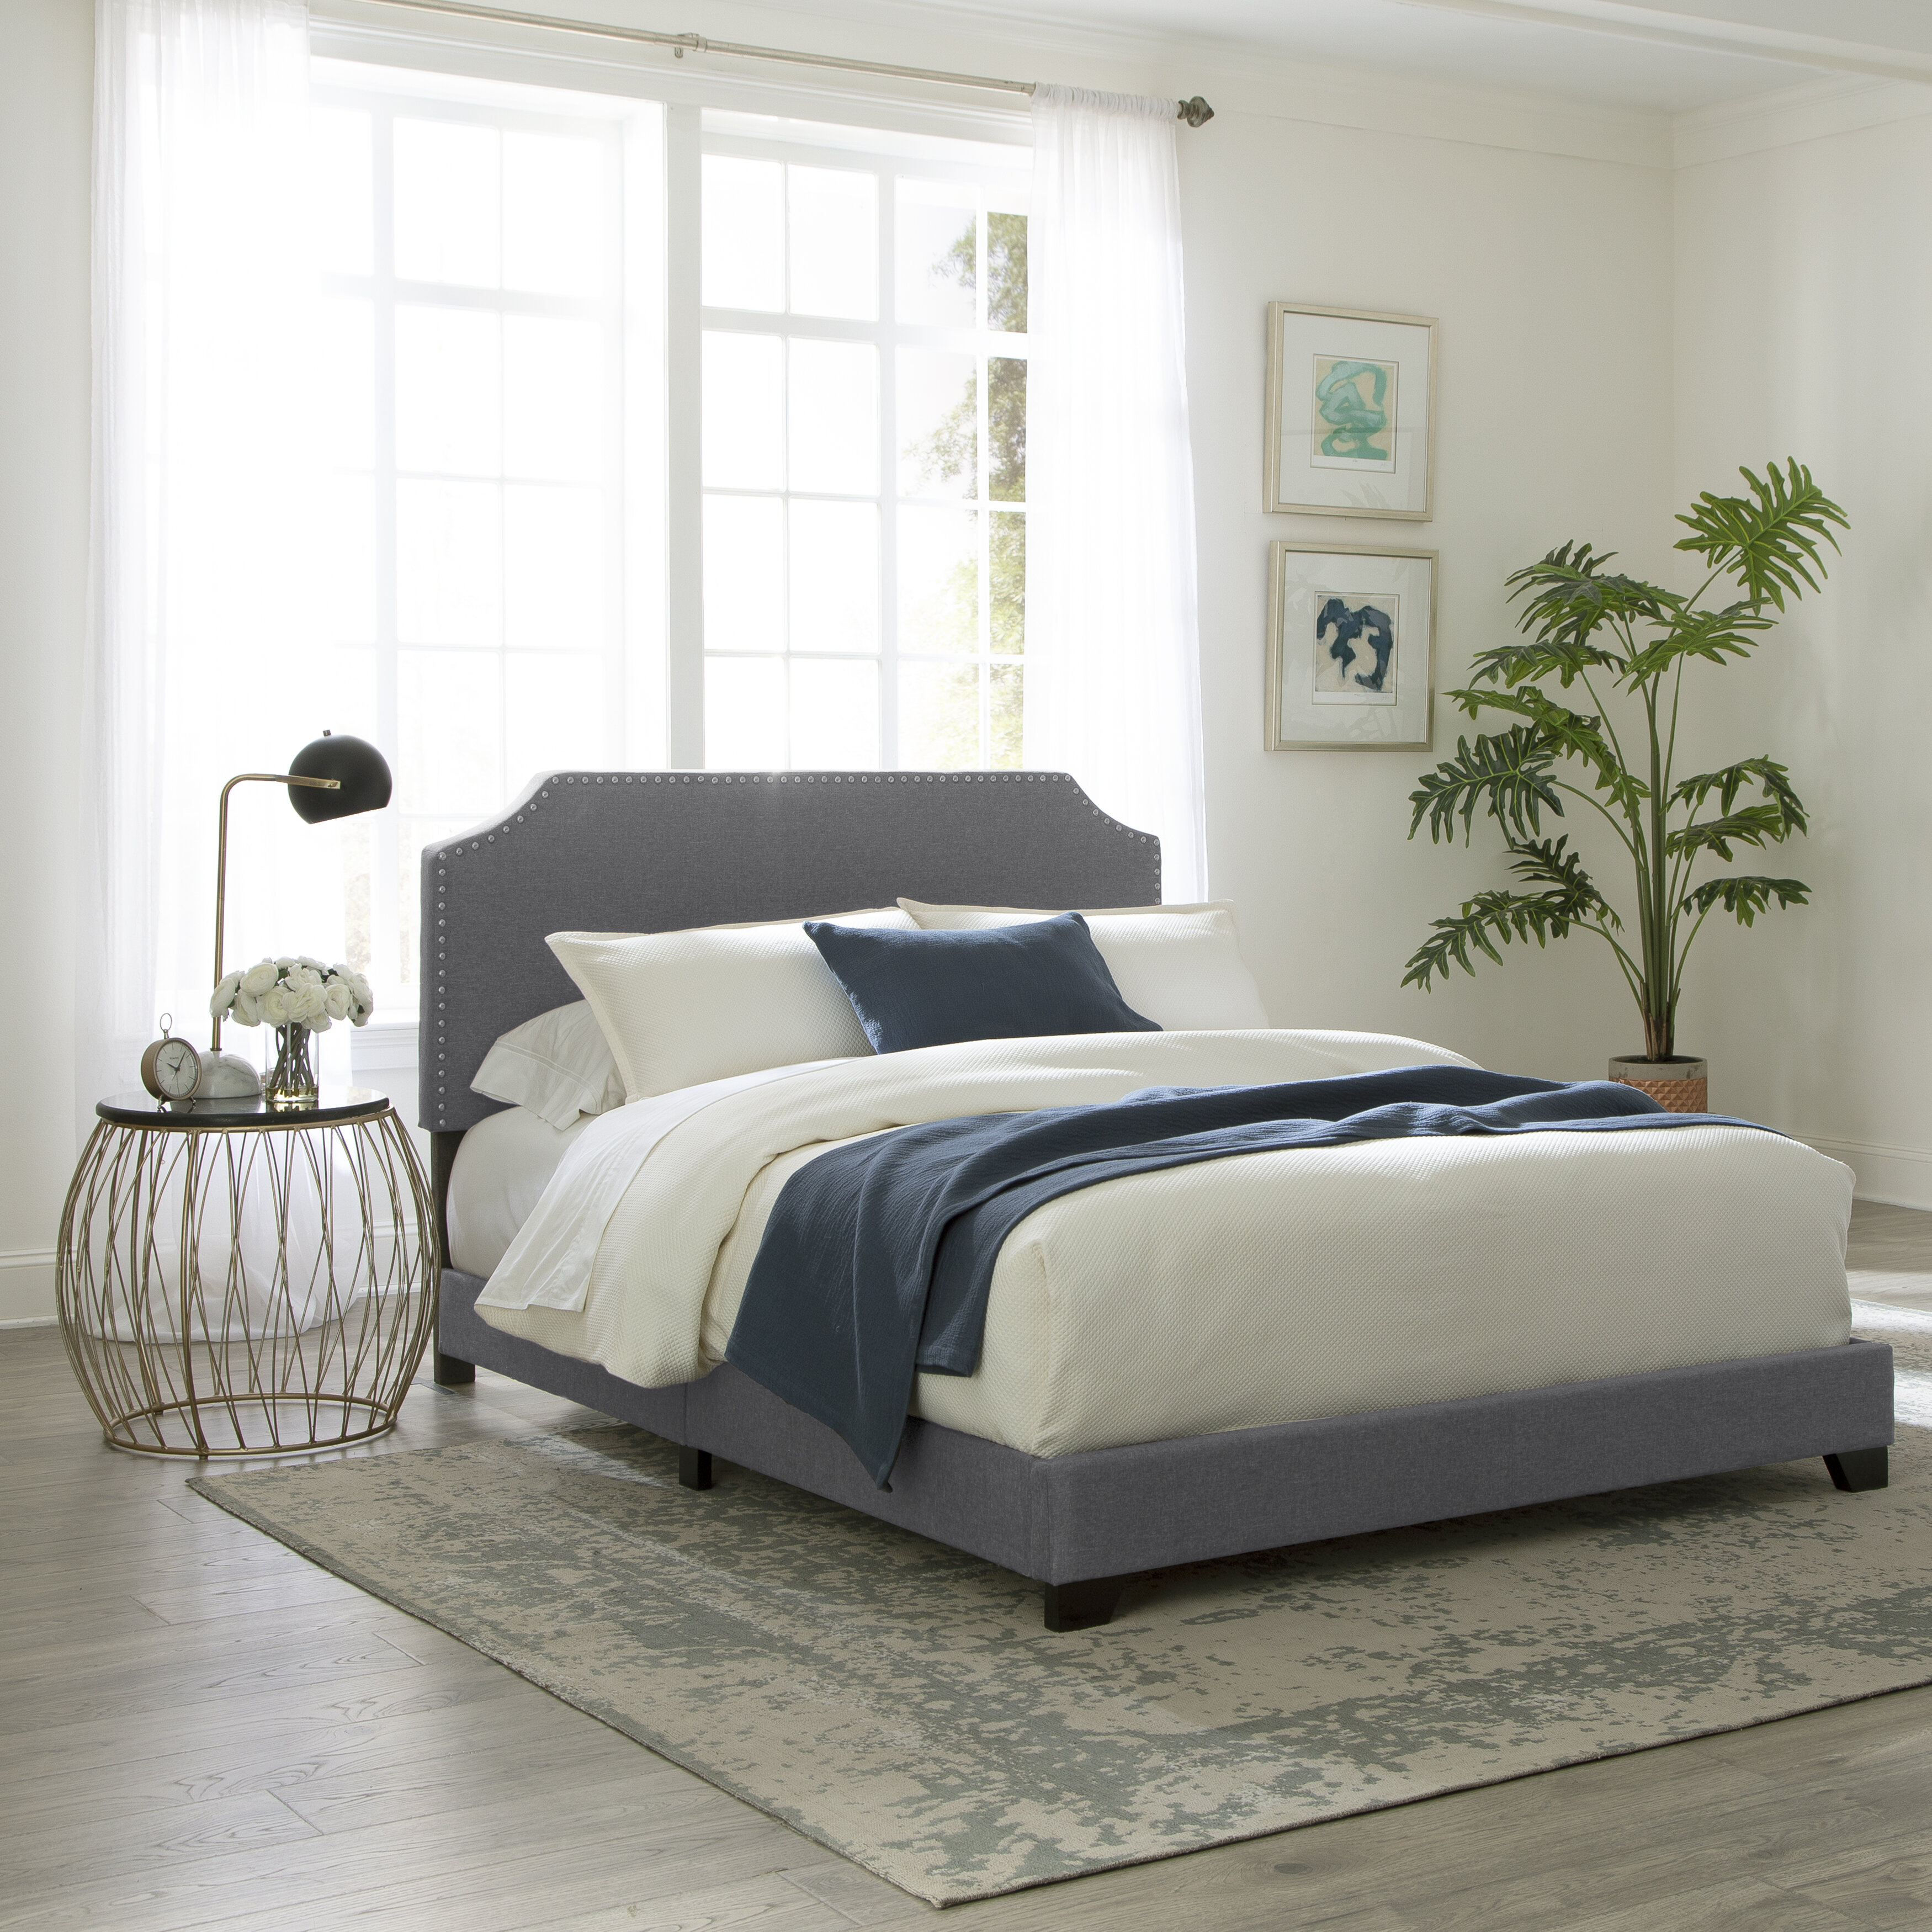 sale retailer 66b9f 40f12 Kyara Upholstered Standard Bed